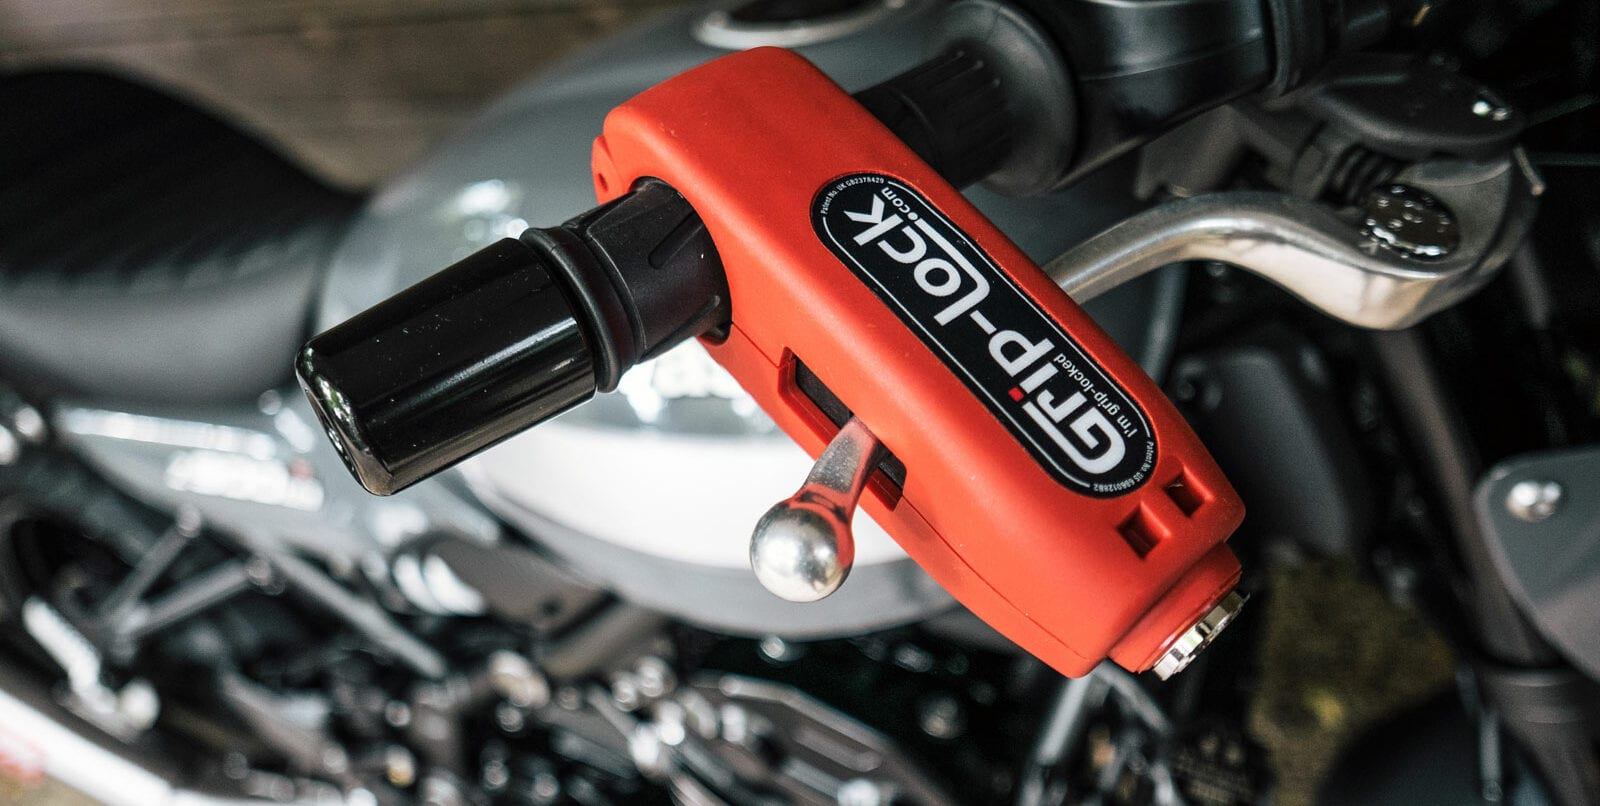 Grip-Lock motorcycle throttle lock